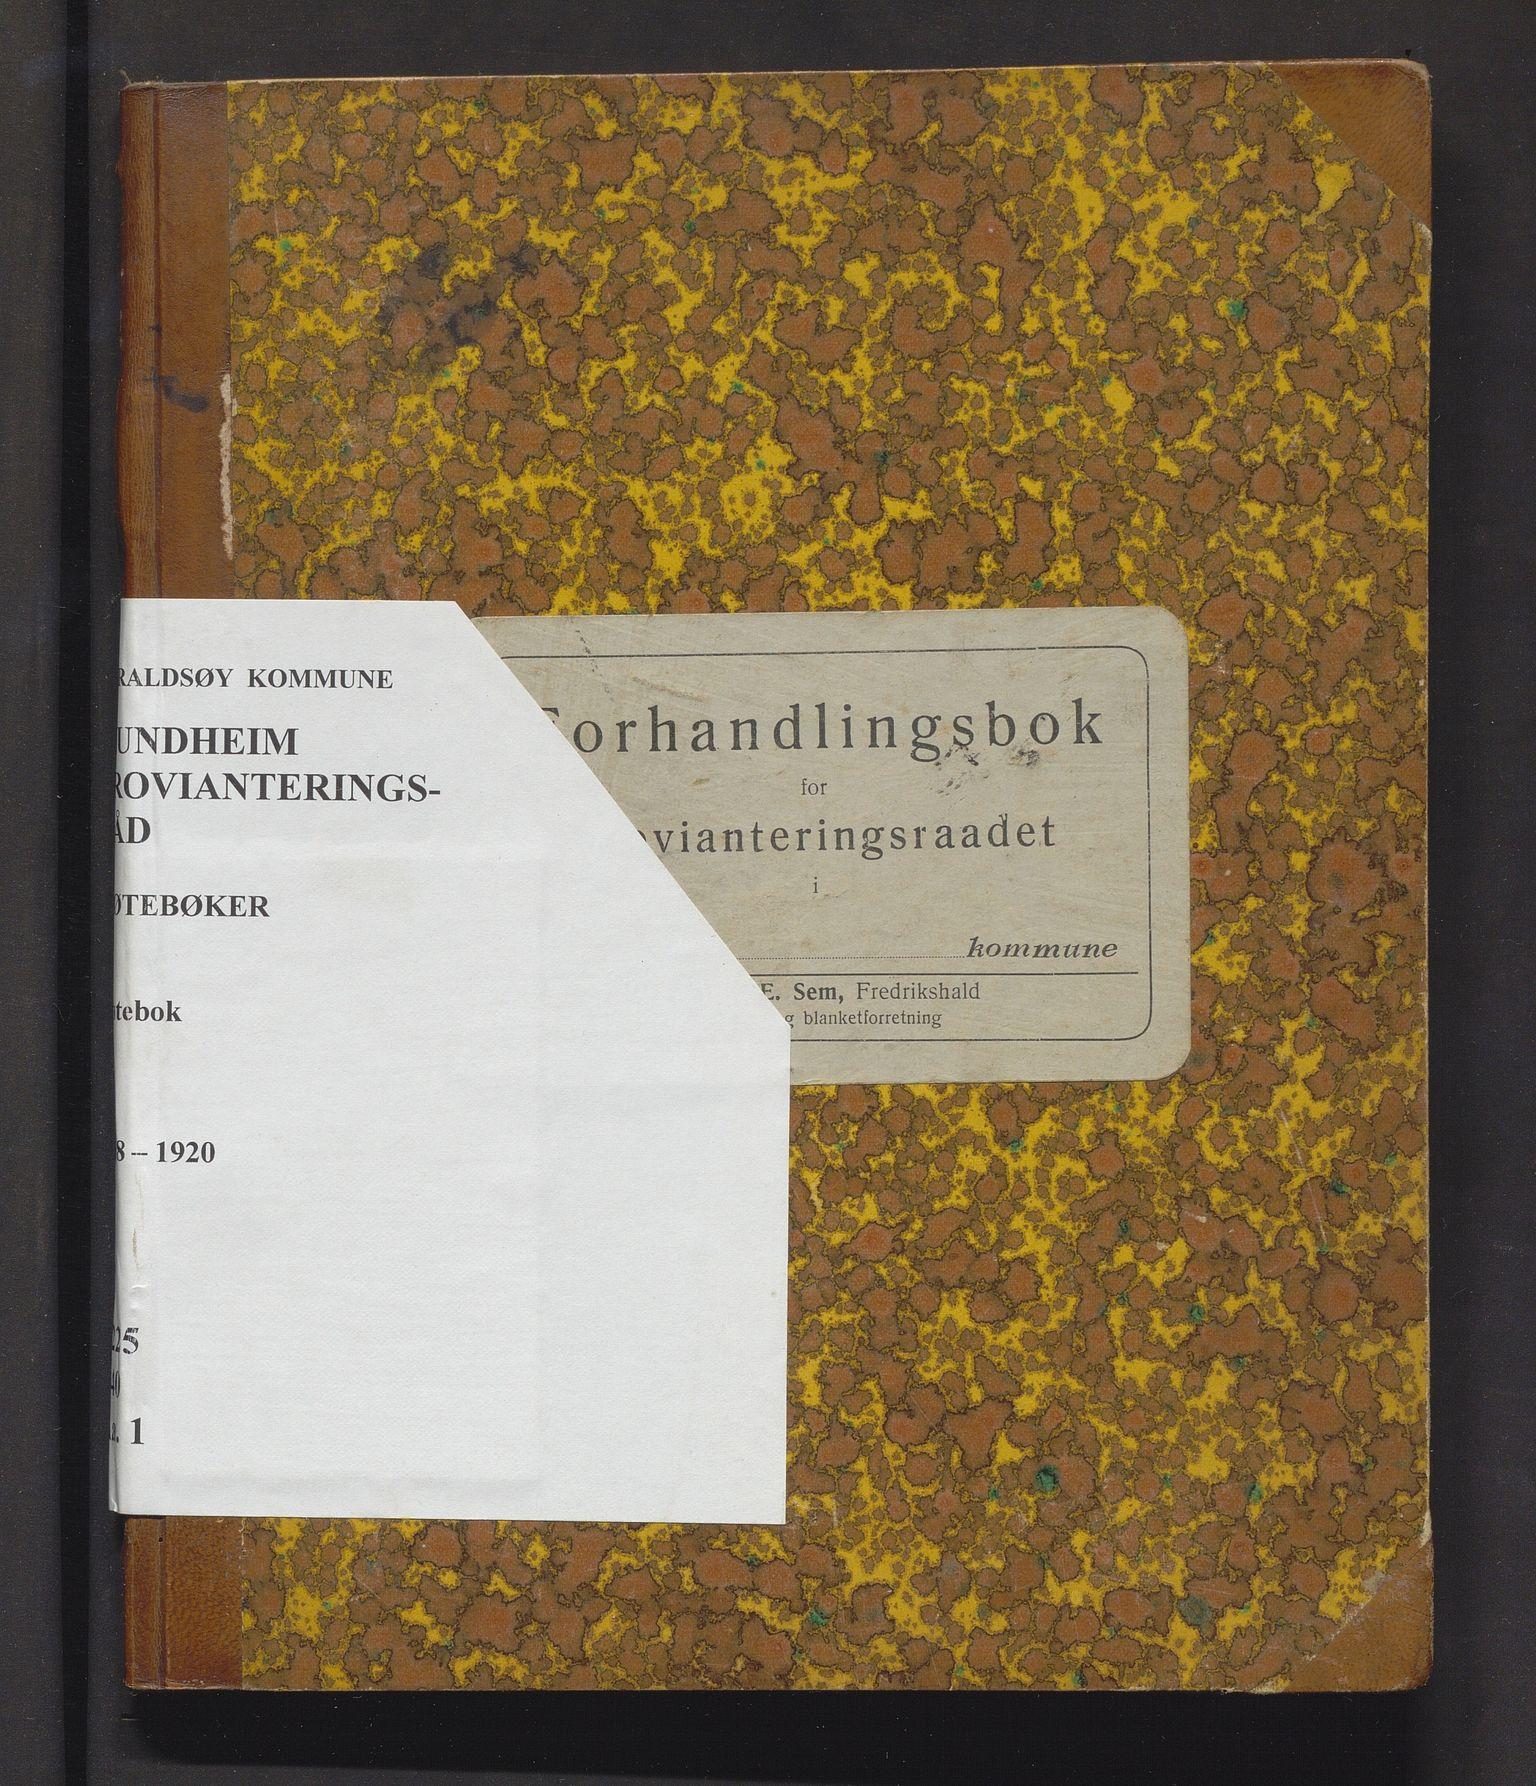 IKAH, Varaldsøy kommune. Mundheim provianteringsråd, A/Aa/L0001: Møtebok for Mundheim provianteringsråd , 1918-1920